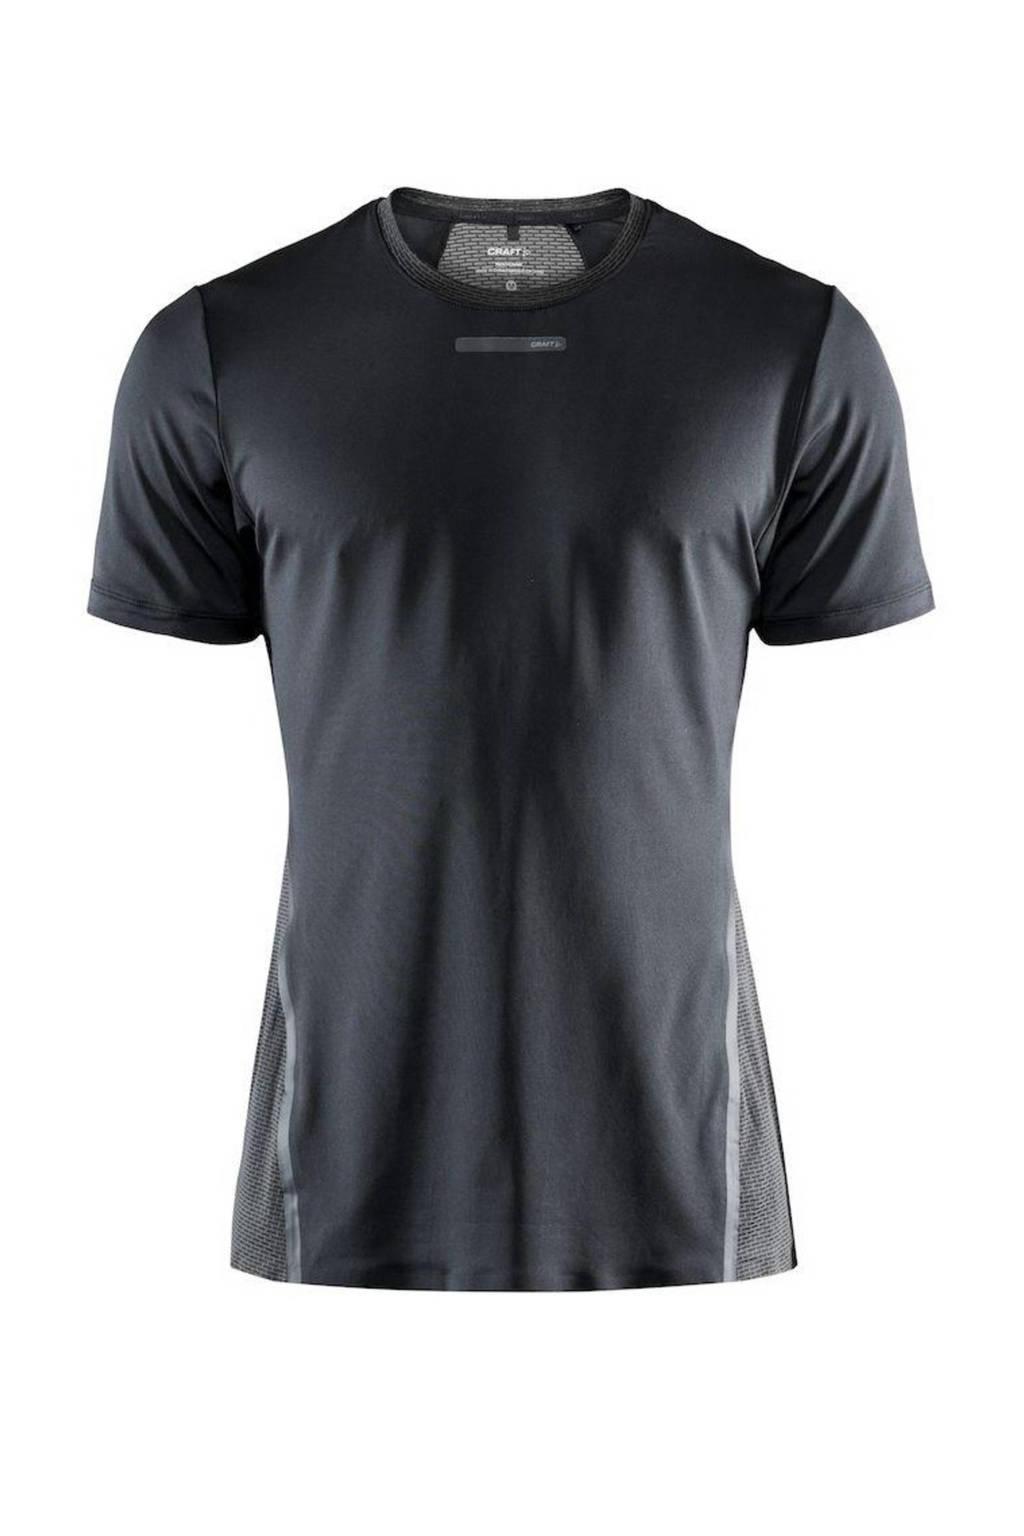 Craft   sport T-shirt antraciet, Antraciet